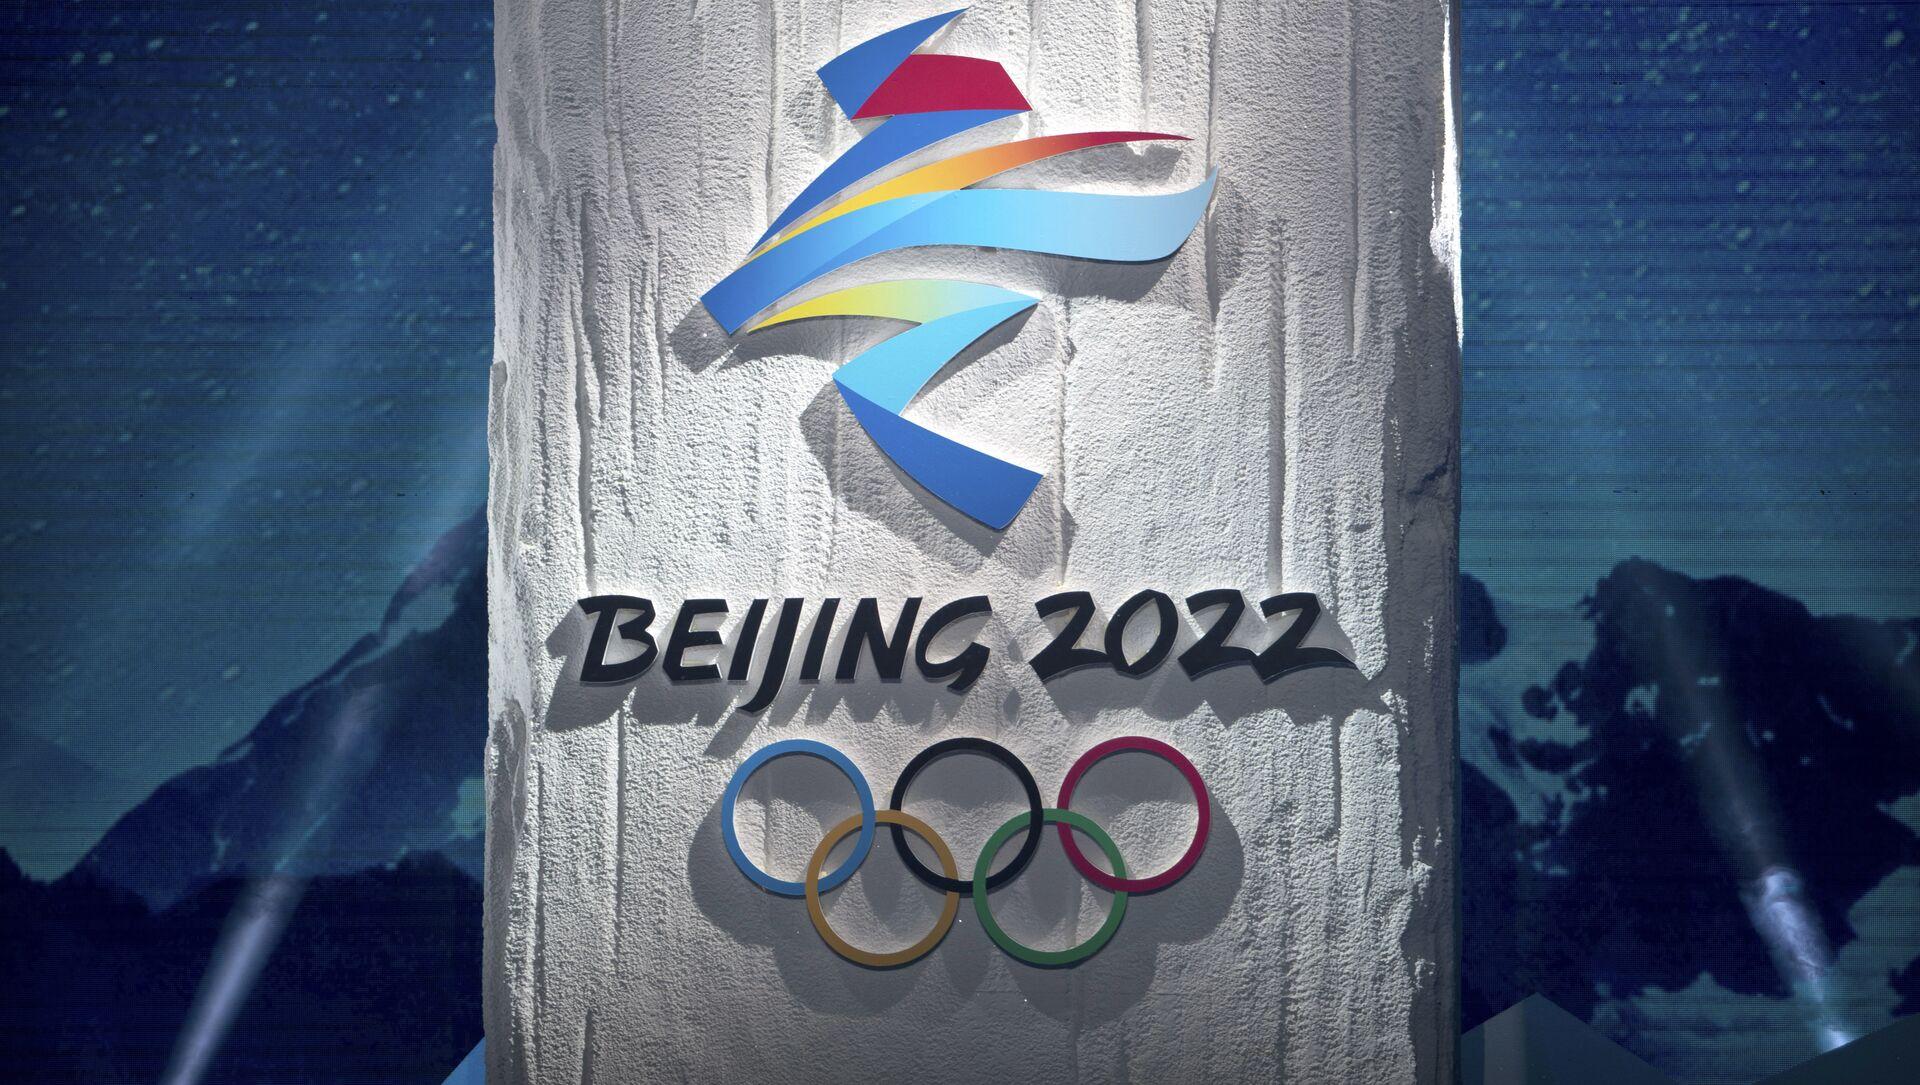 Logo de JJOO 2022 en Pekín - Sputnik Mundo, 1920, 04.02.2021